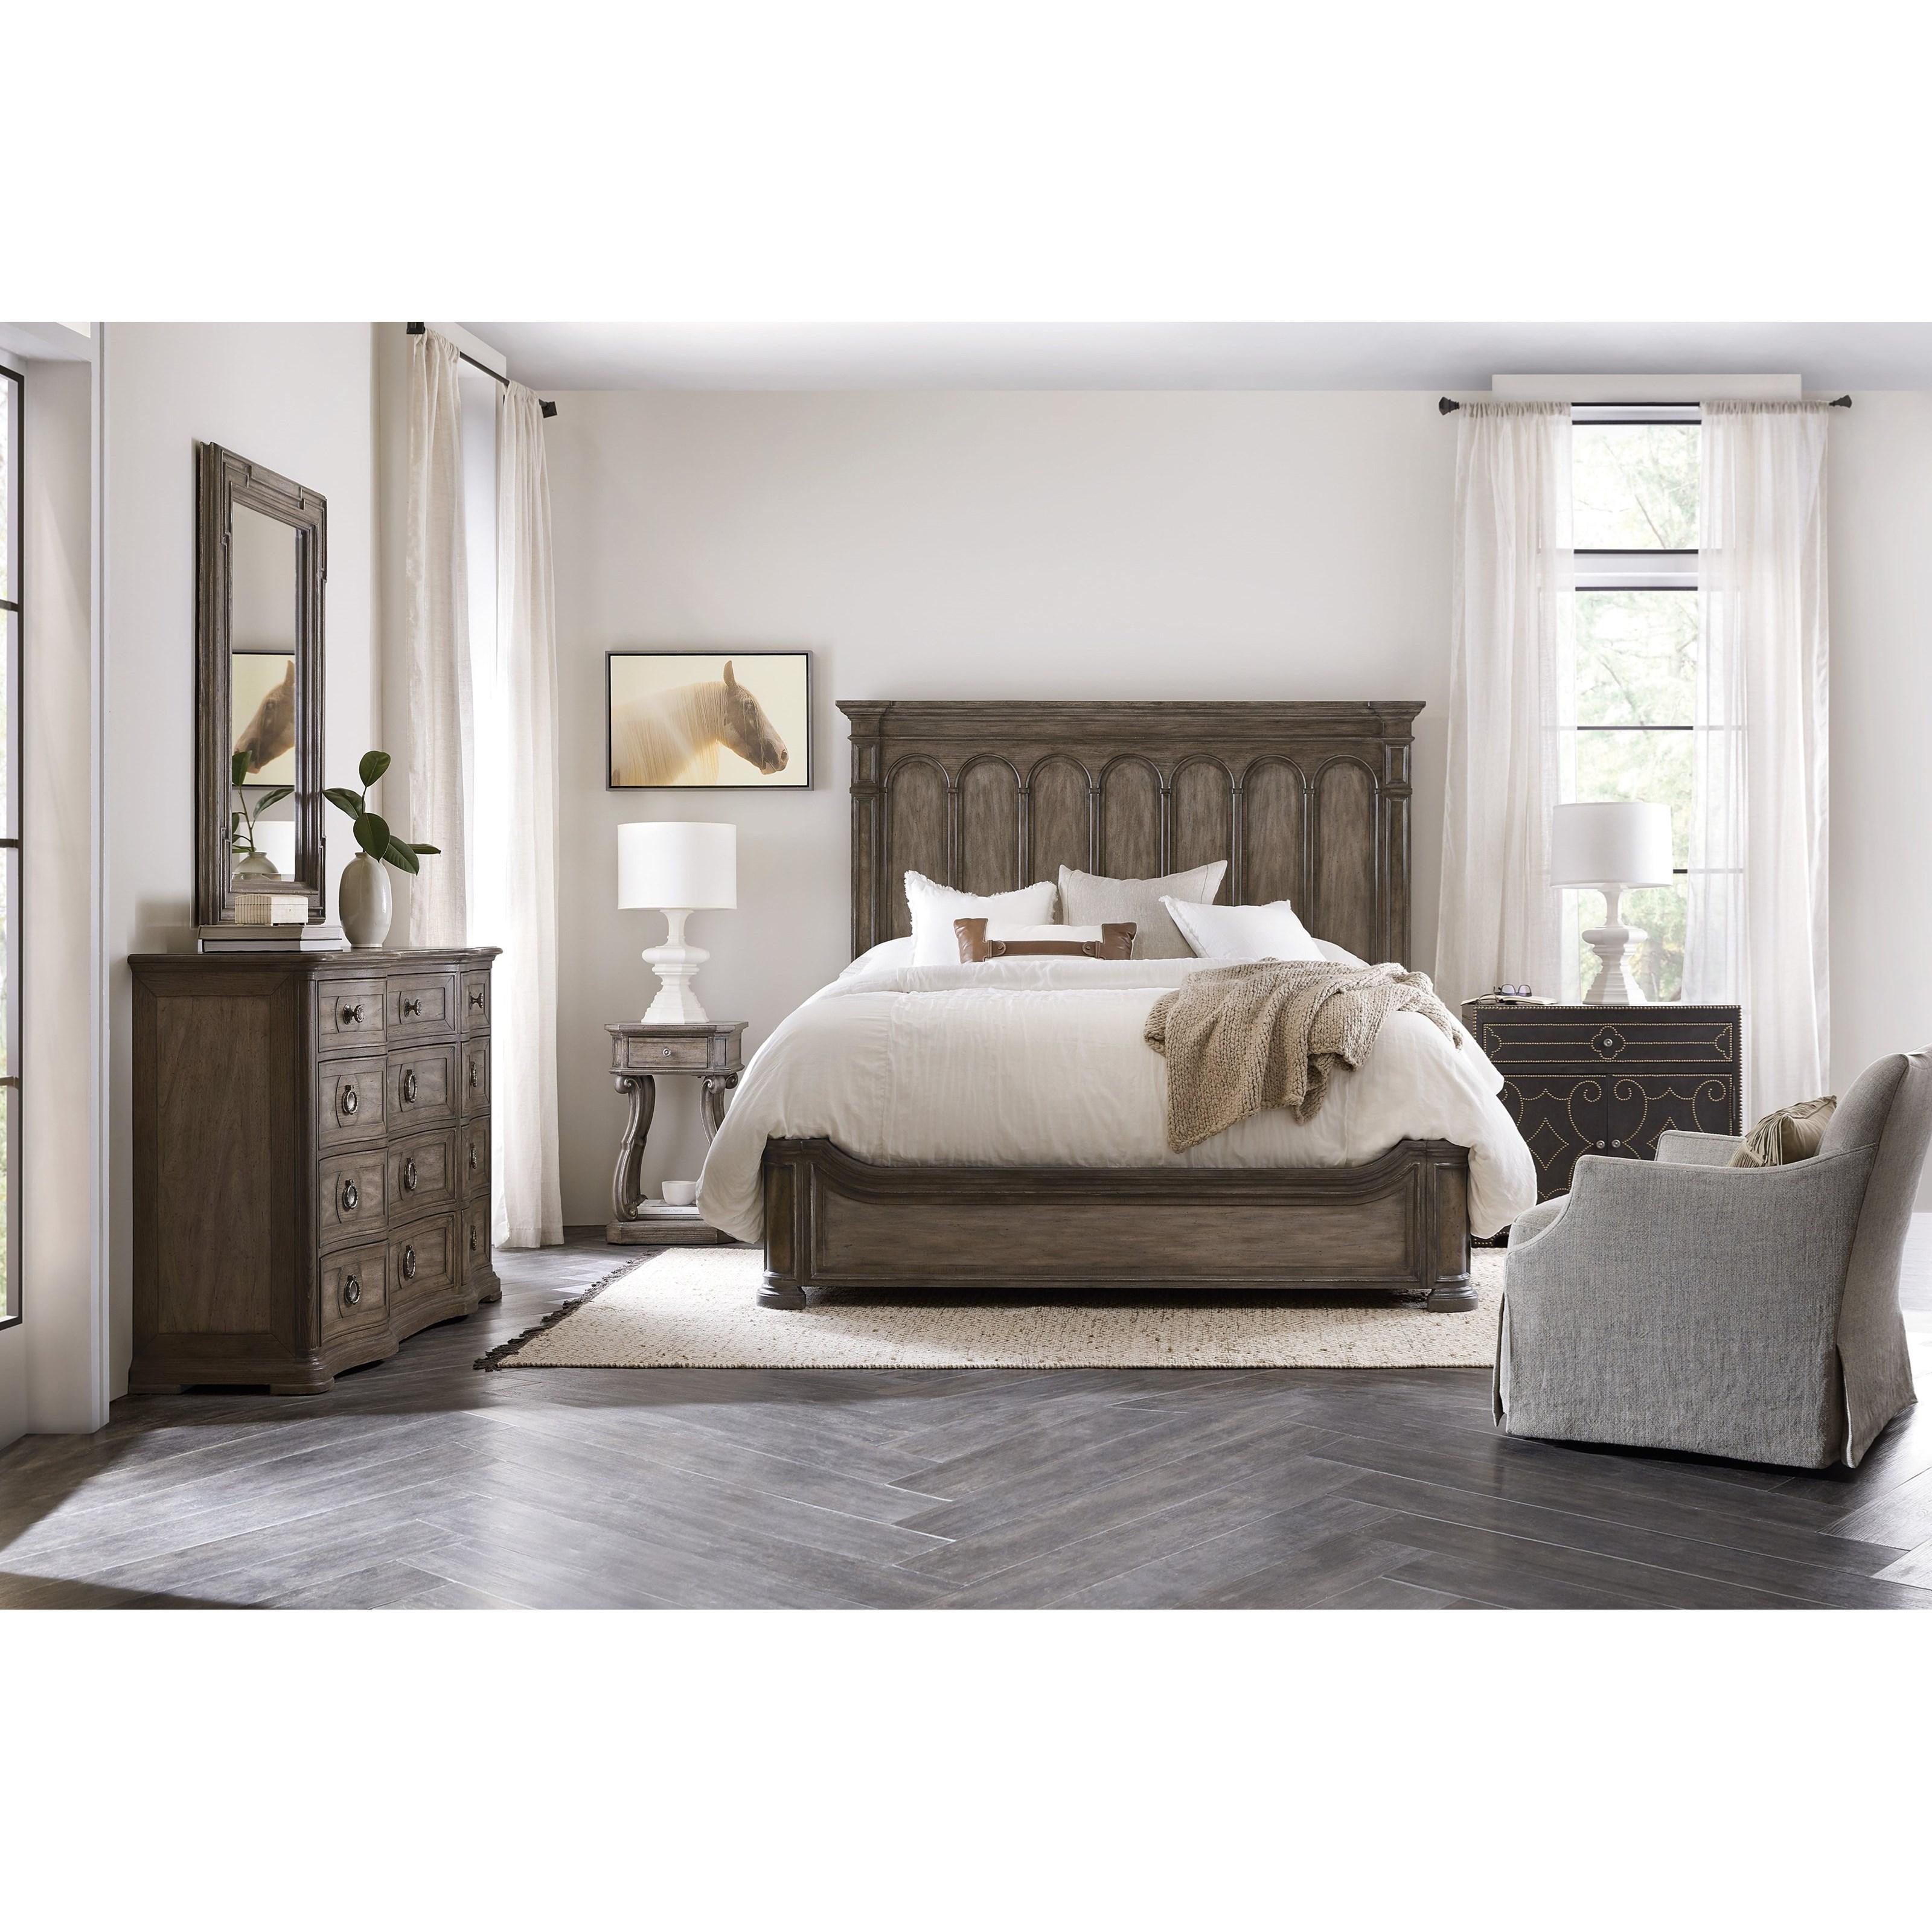 Woodlands King Bedroom Group by Hooker Furniture at Alison Craig Home Furnishings